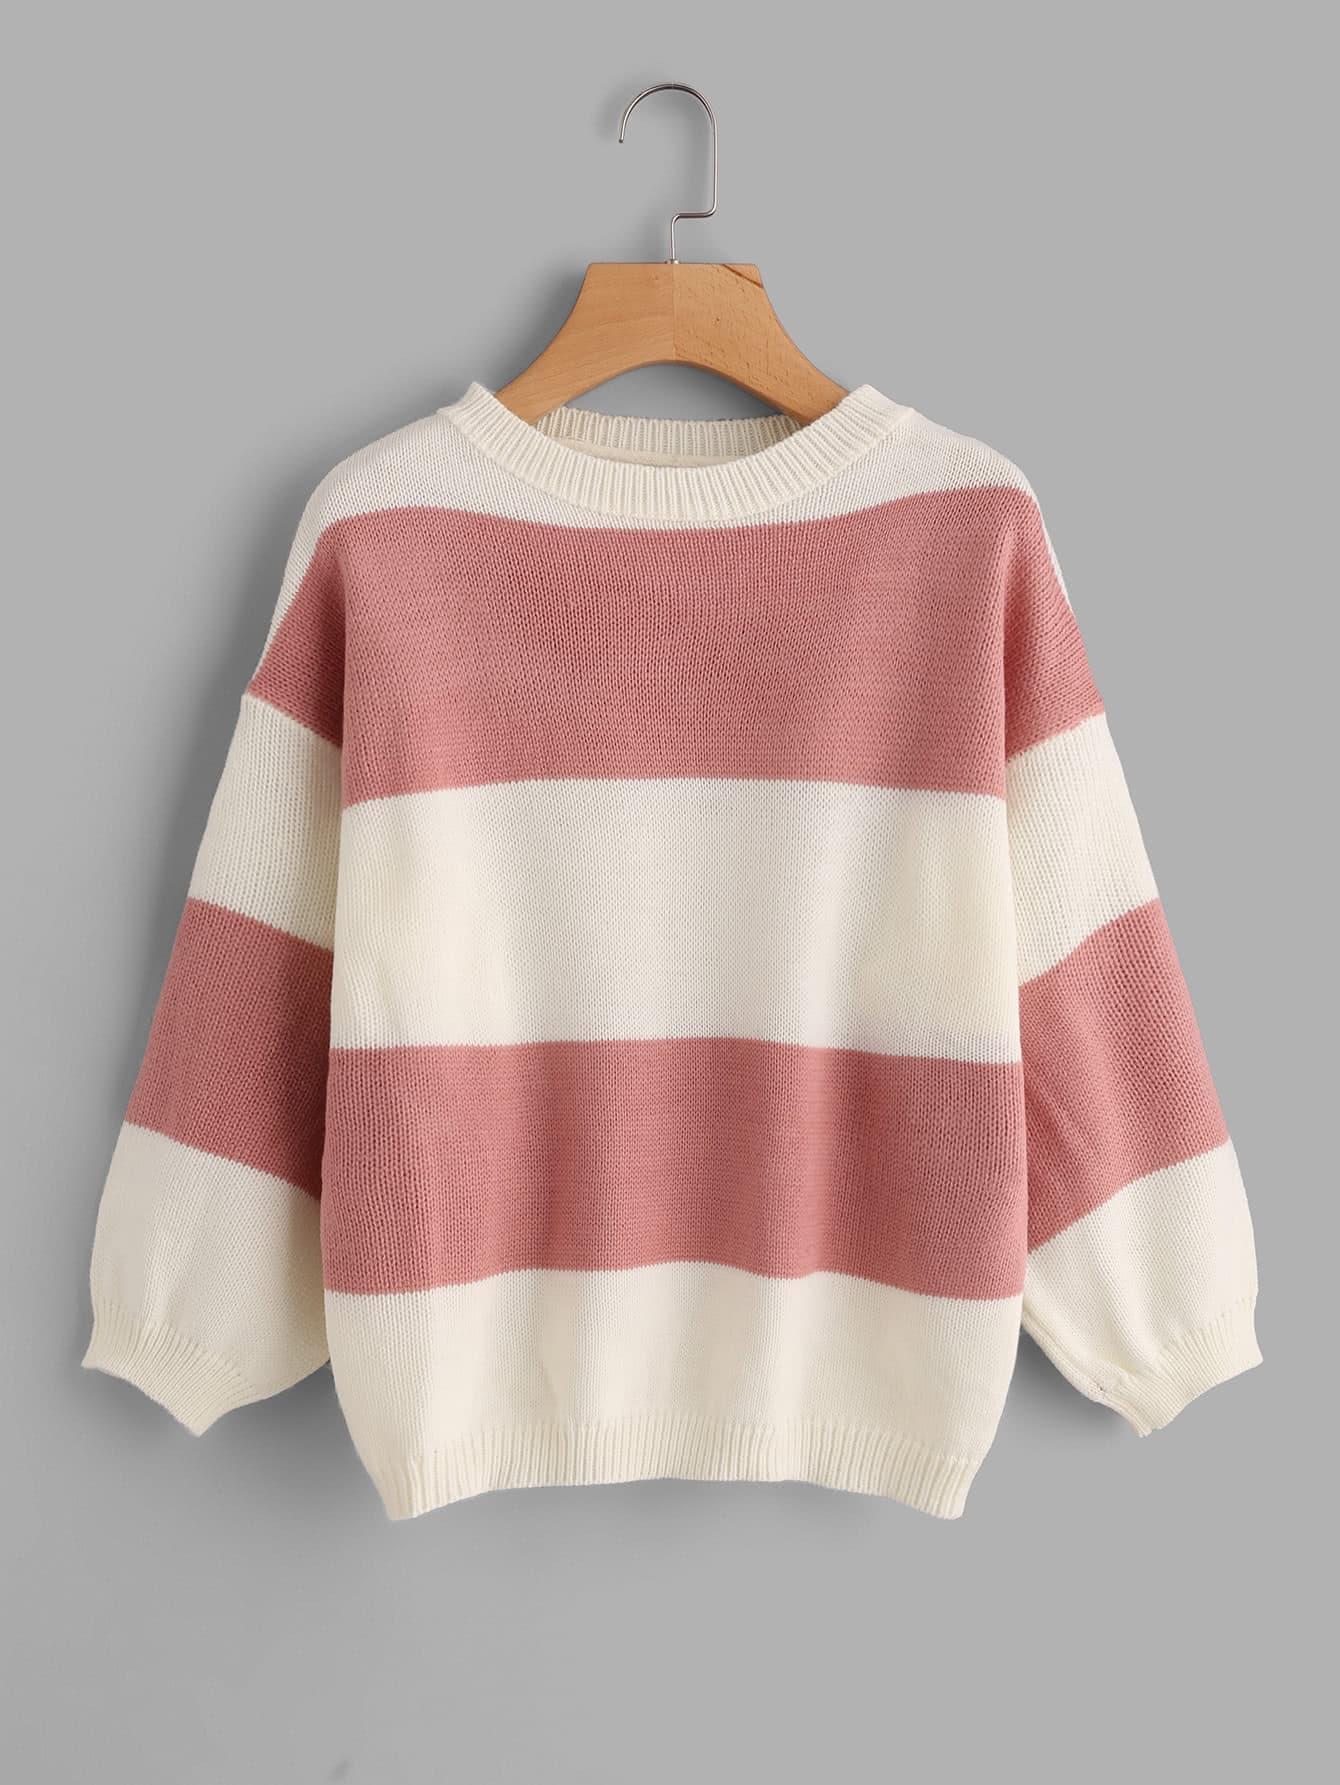 Wide Striped Sweater -SheIn(Sheinside)